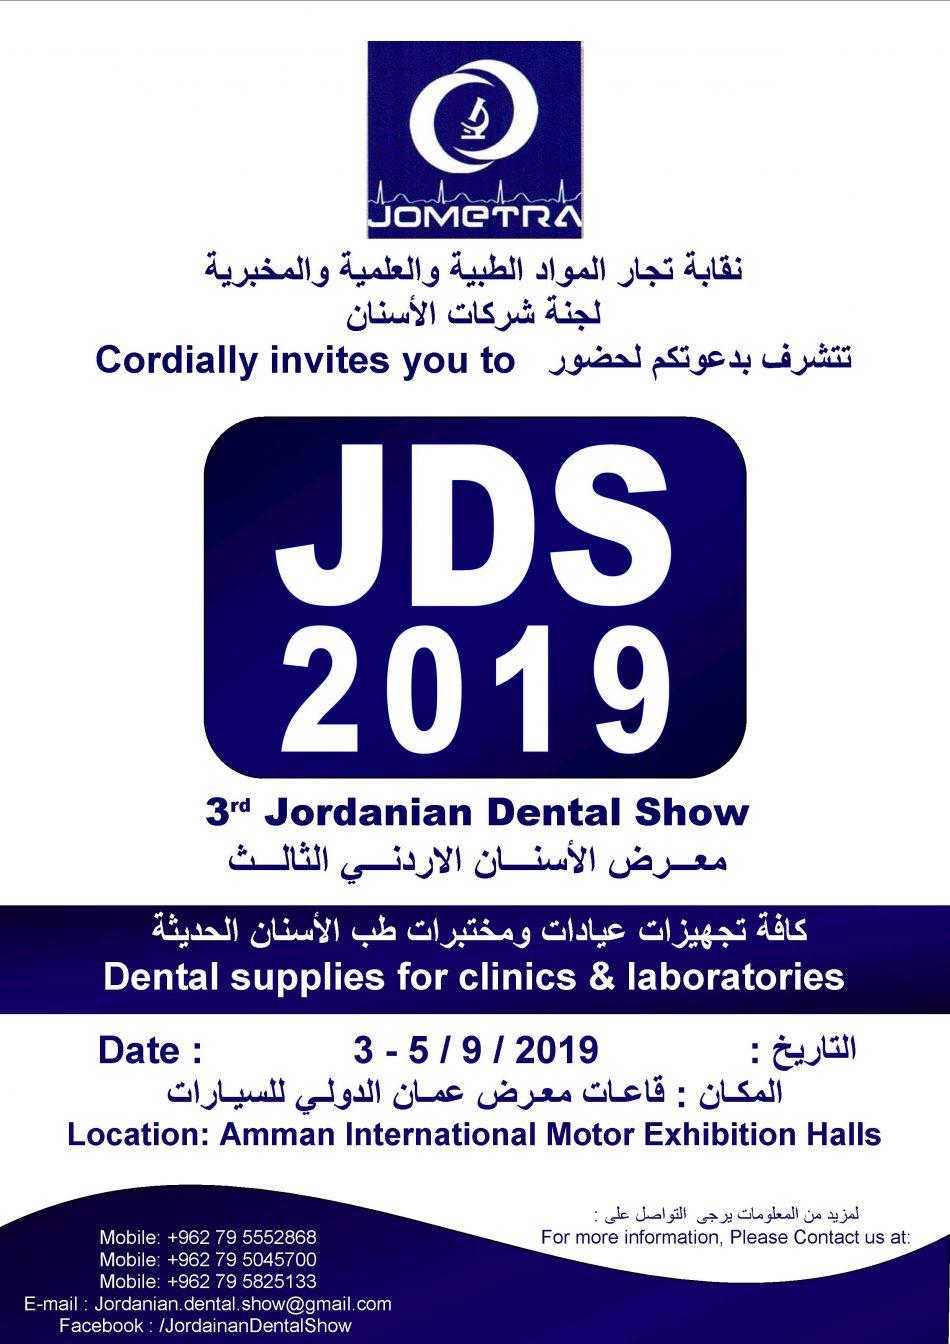 Jordanian Dental Show 2019